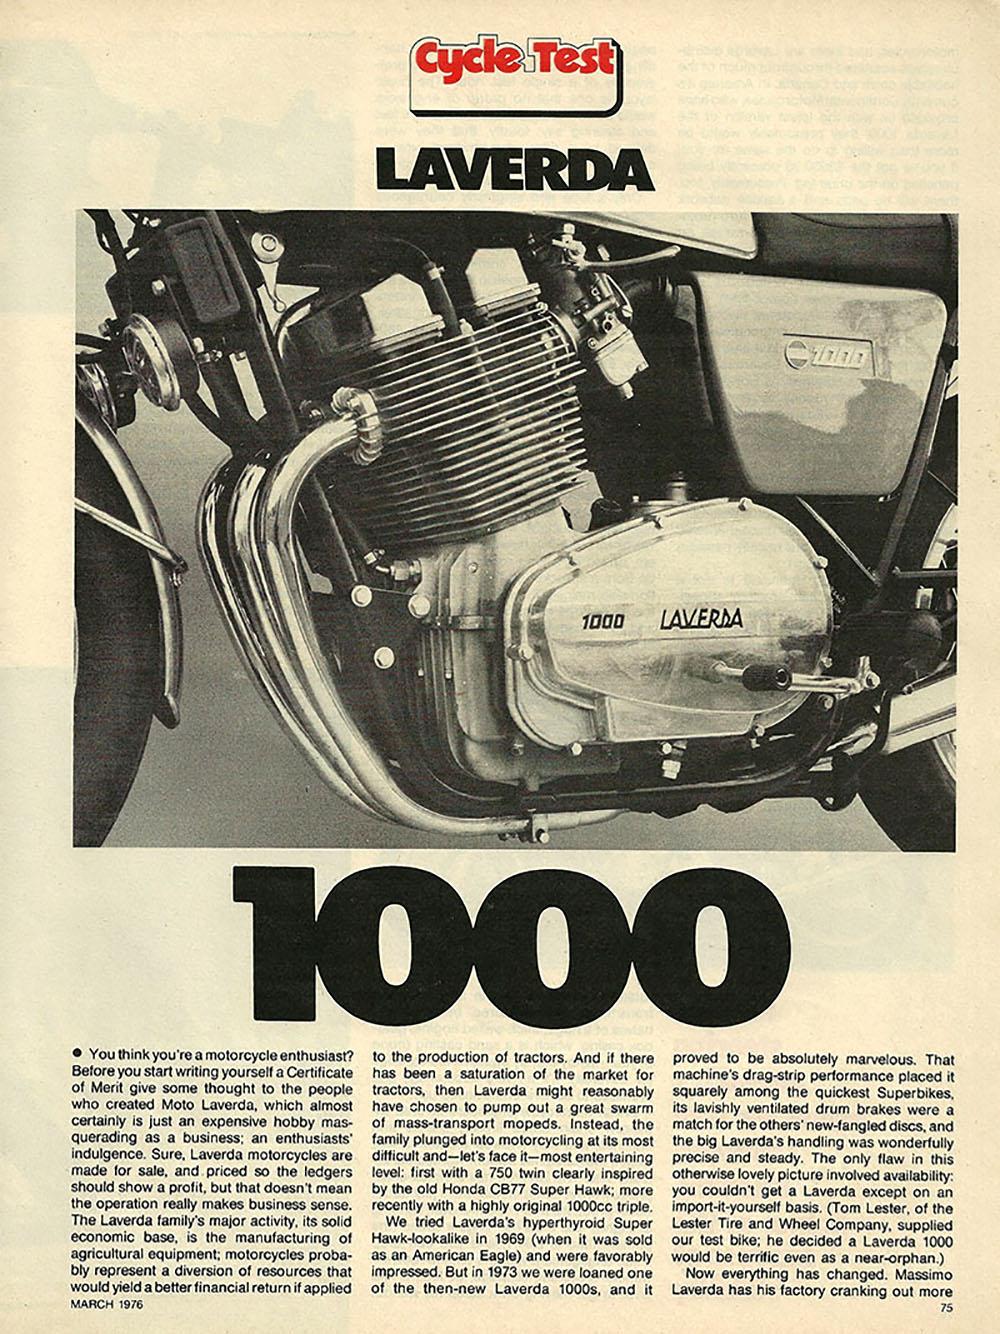 1976 Laverda 1000 road test 1.JPG